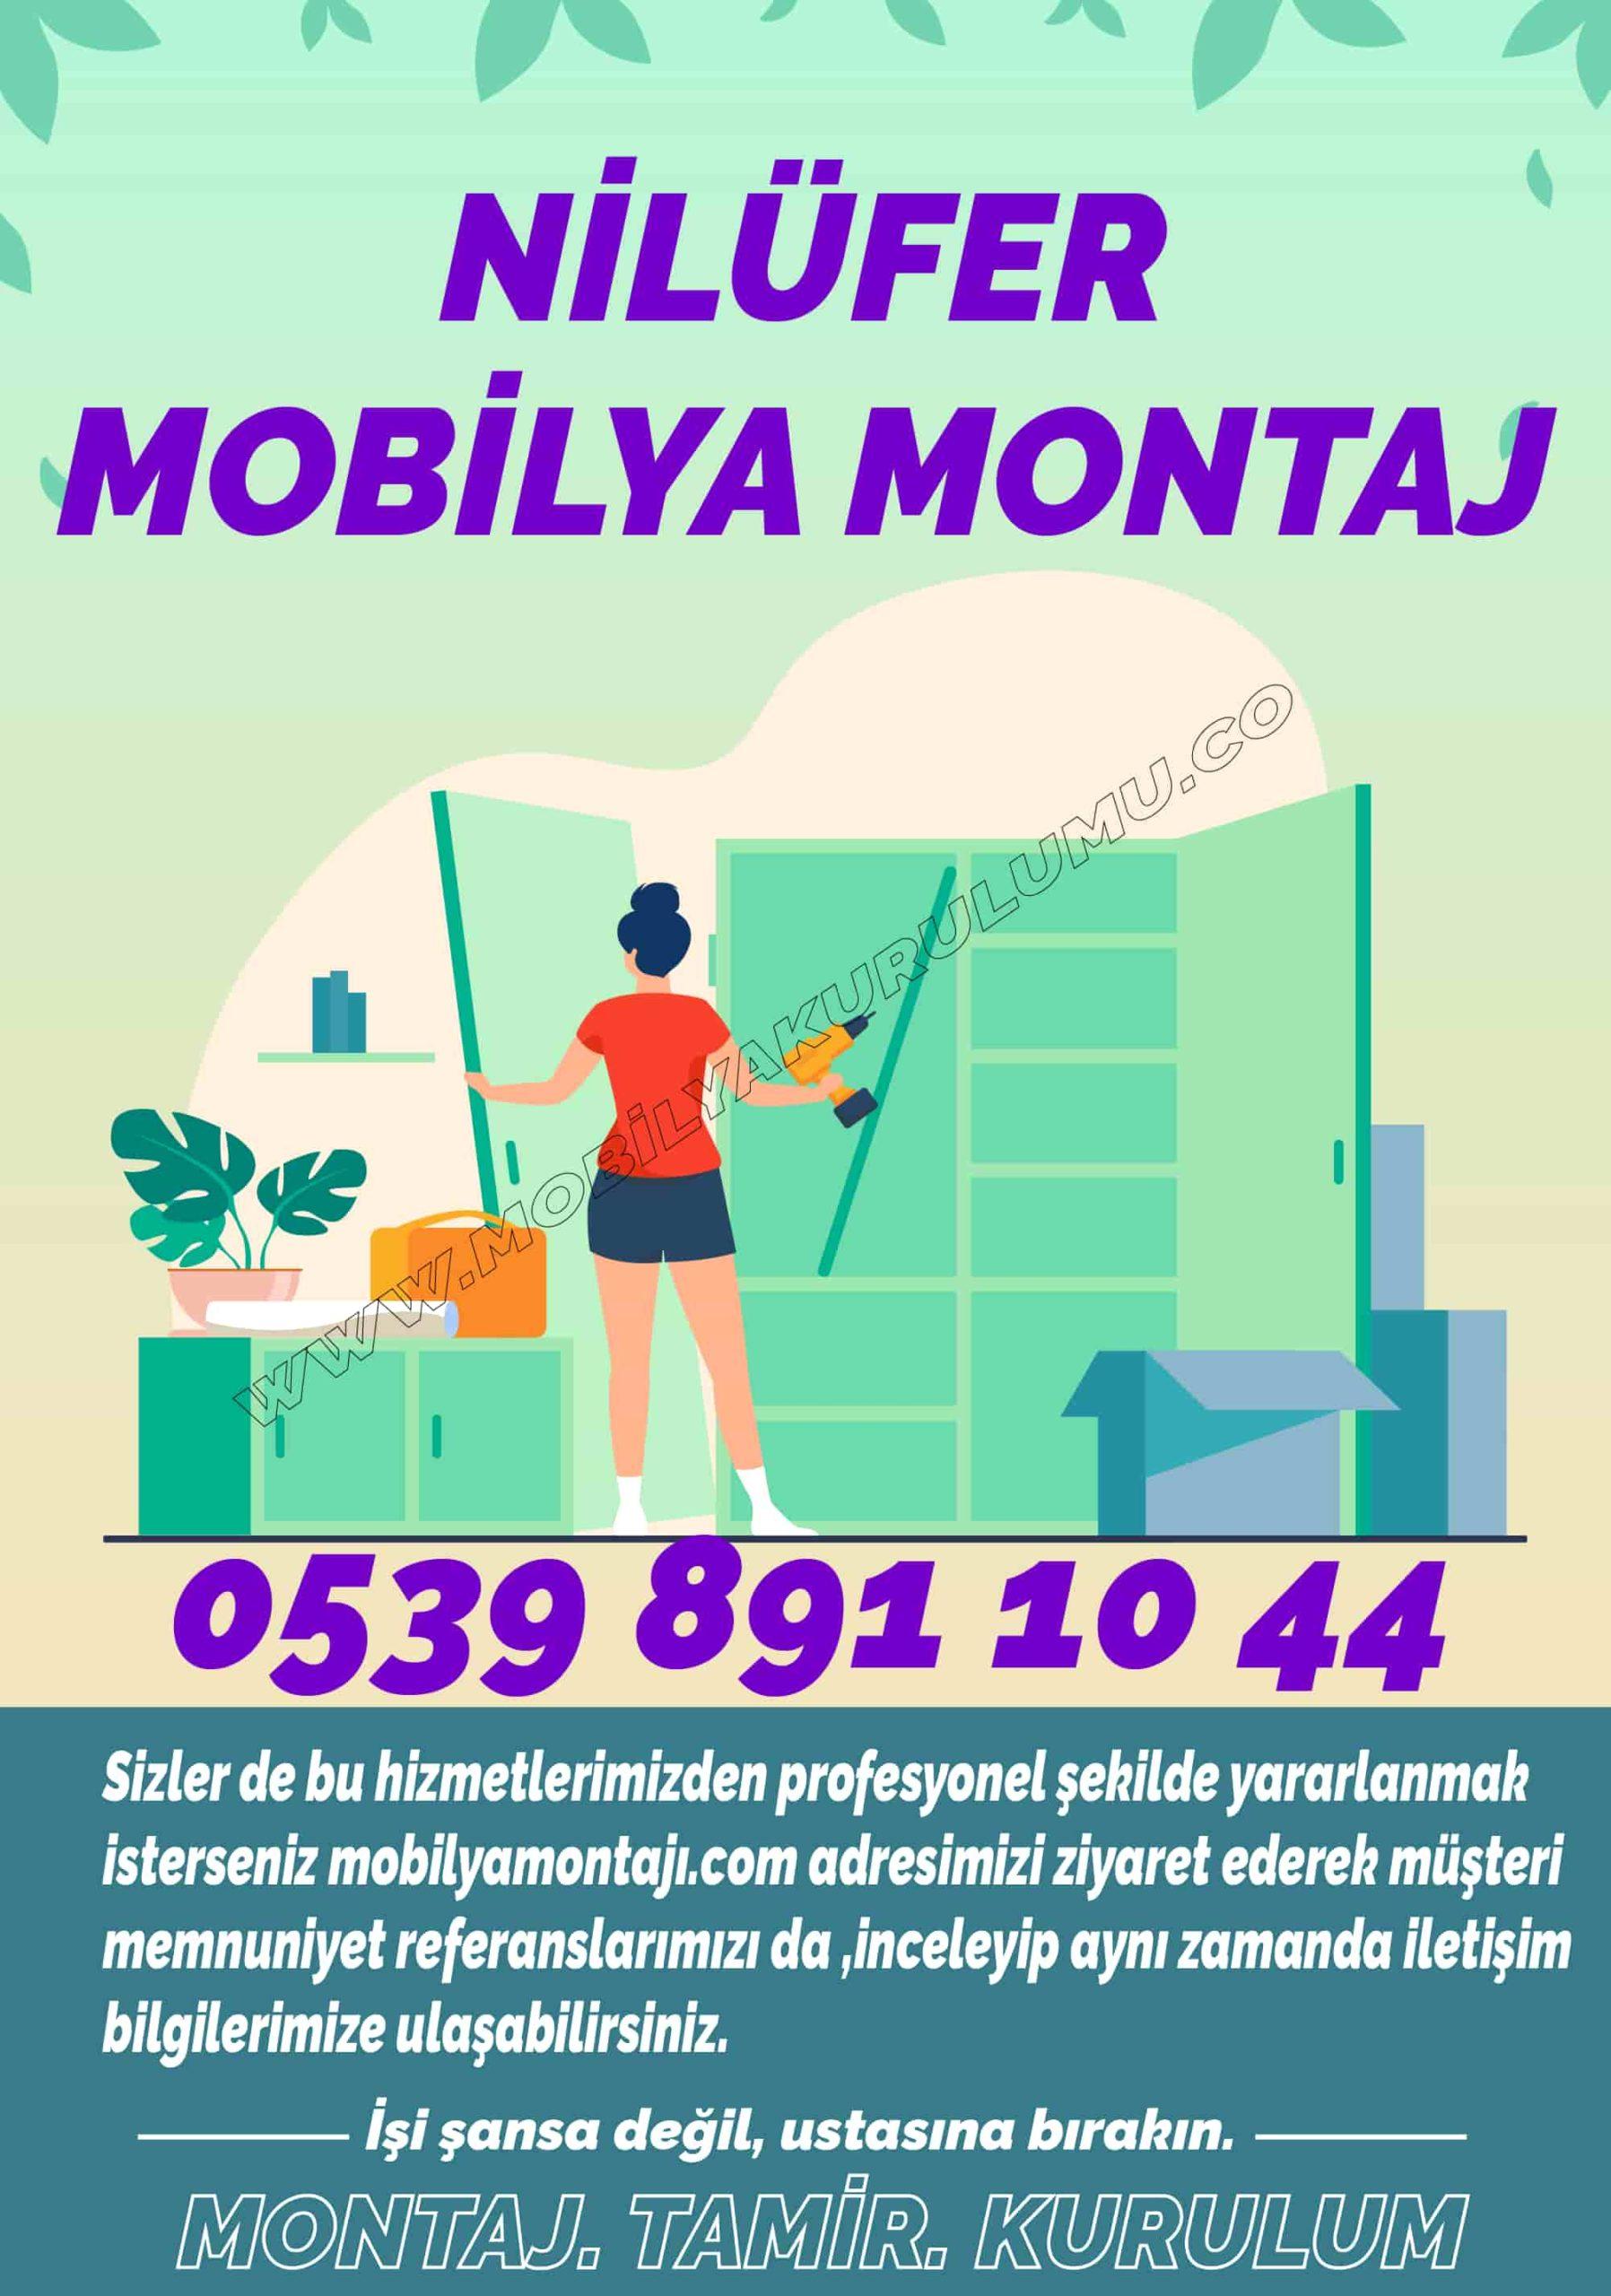 Mobilya montaj Nilüfer Bursa